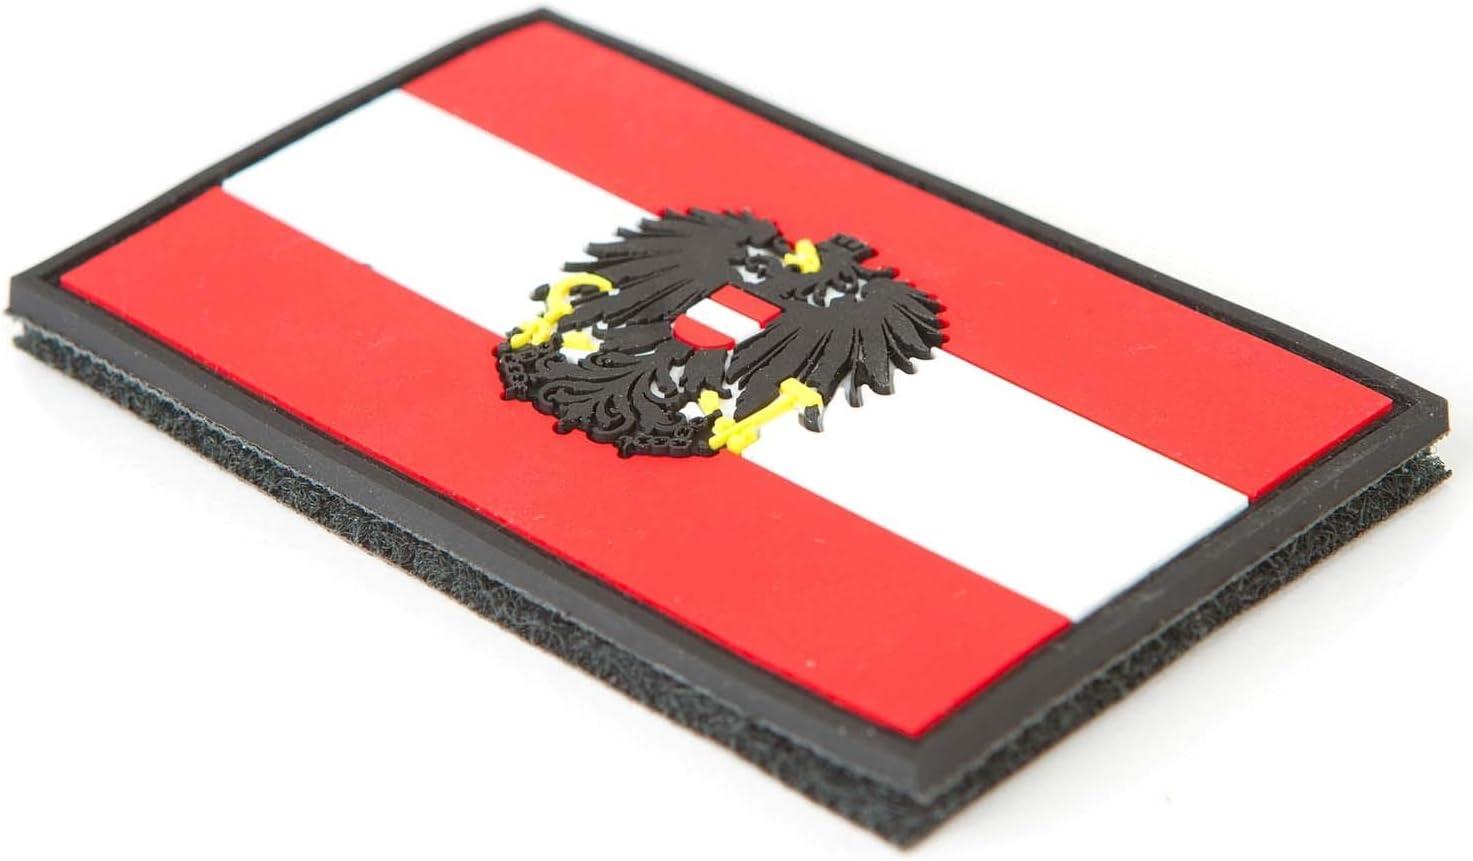 STEINADLER - Bandera de Austria de PVC, Parche de Velcro como ...